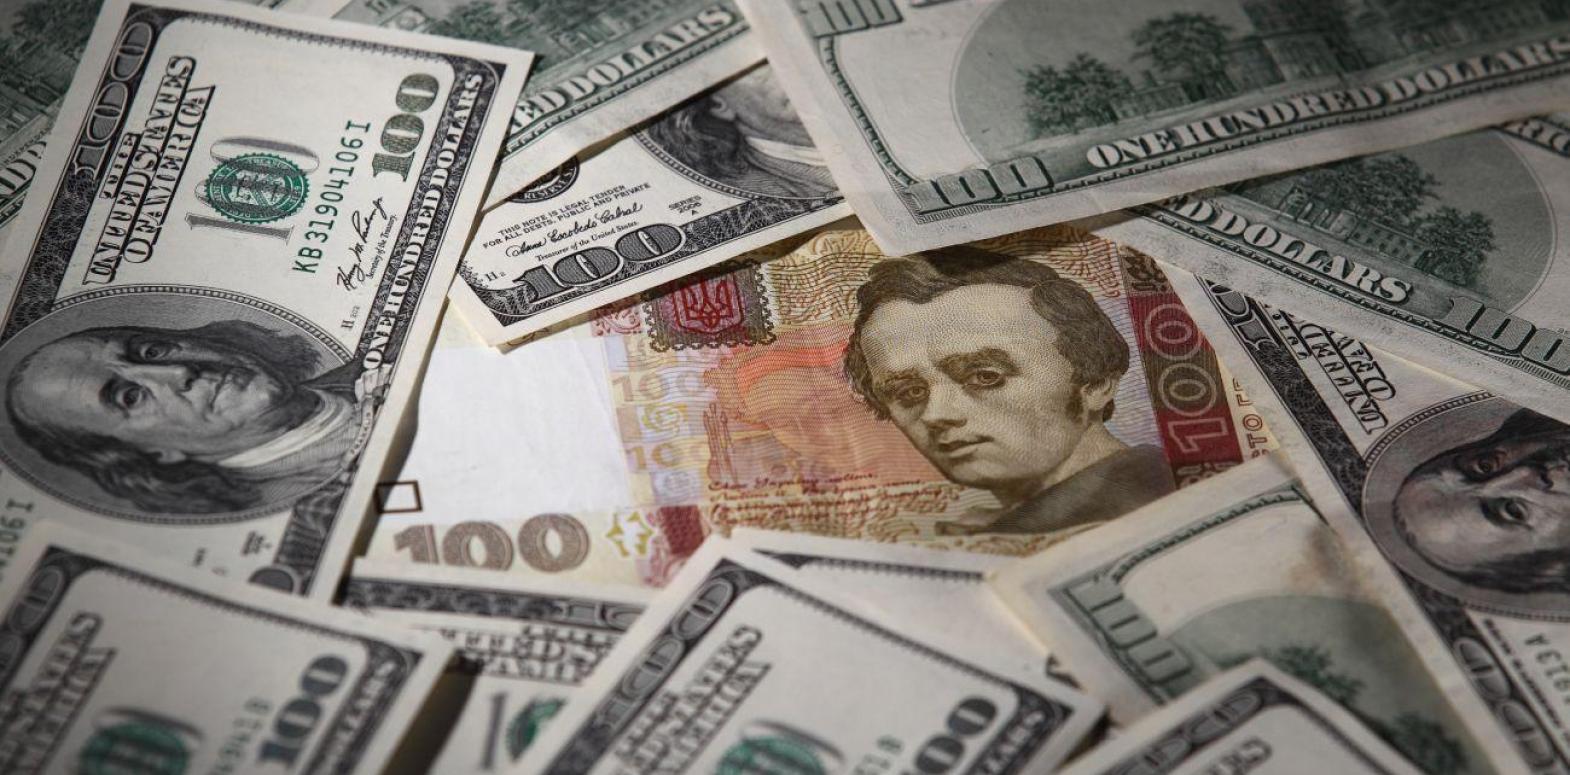 Доллар подорожал почти на 20 копеек. НБУ установил курс на 25 июня